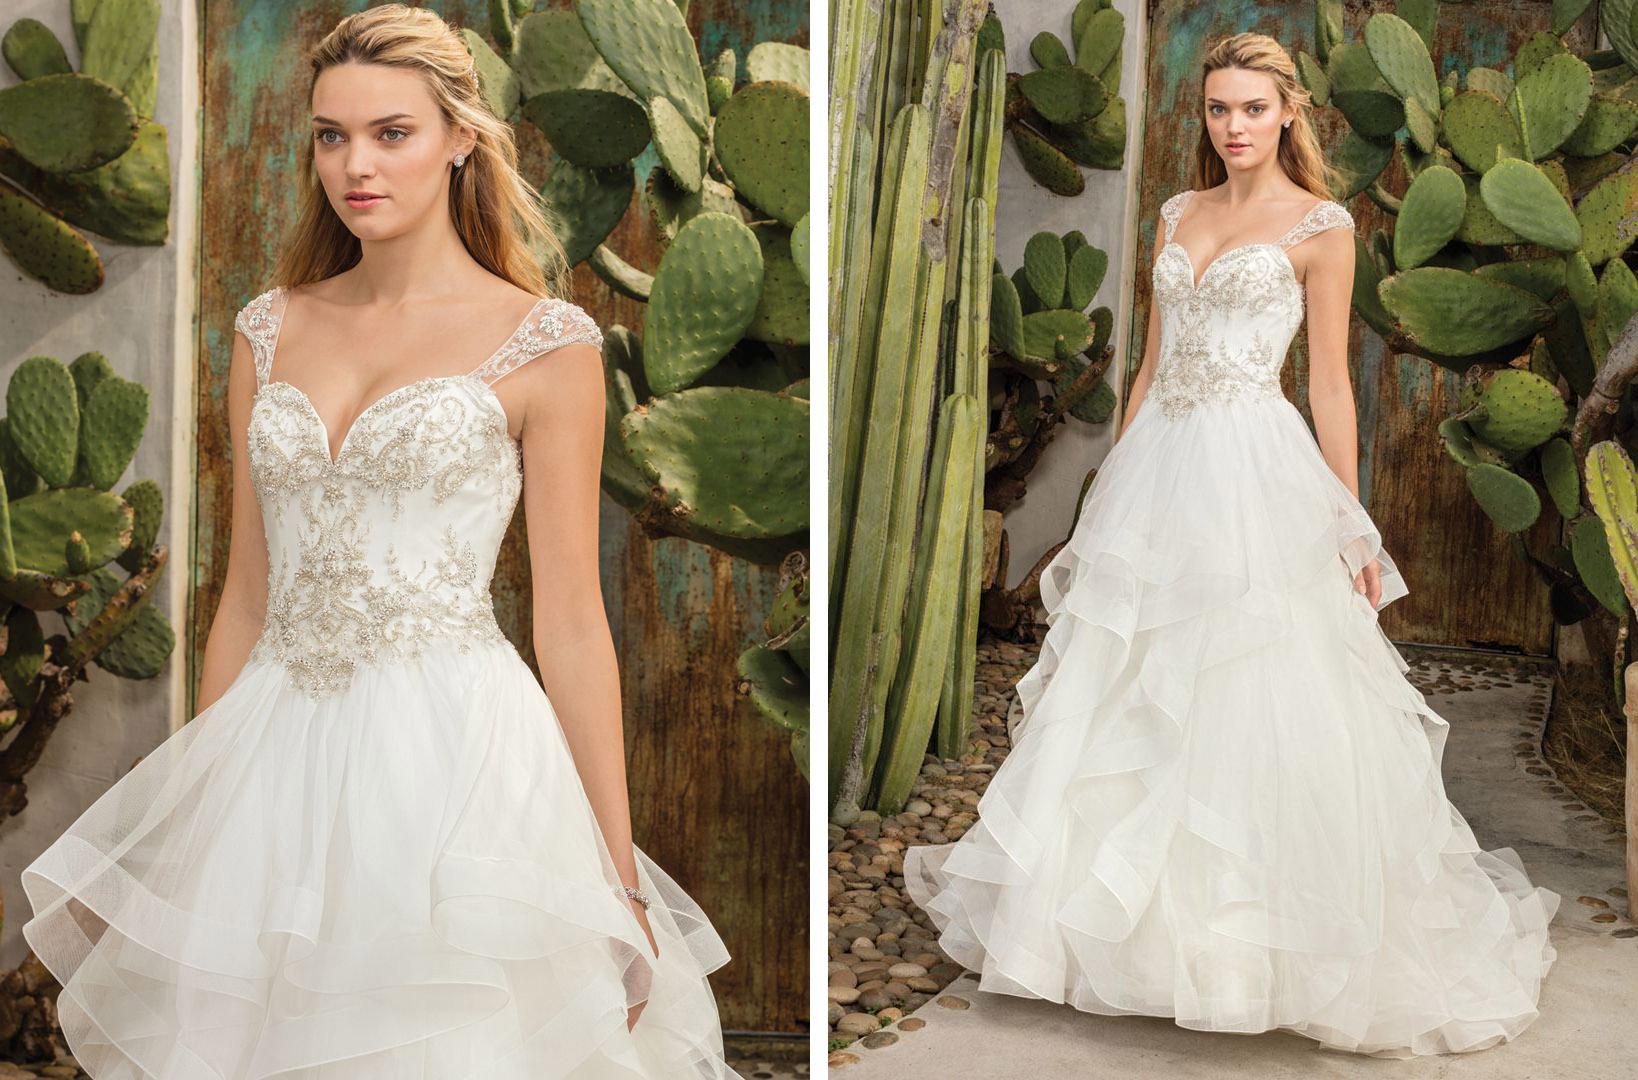 Top Ruffled Wedding Dresses By Casablanca Bridal Blog Casablanca Bridal